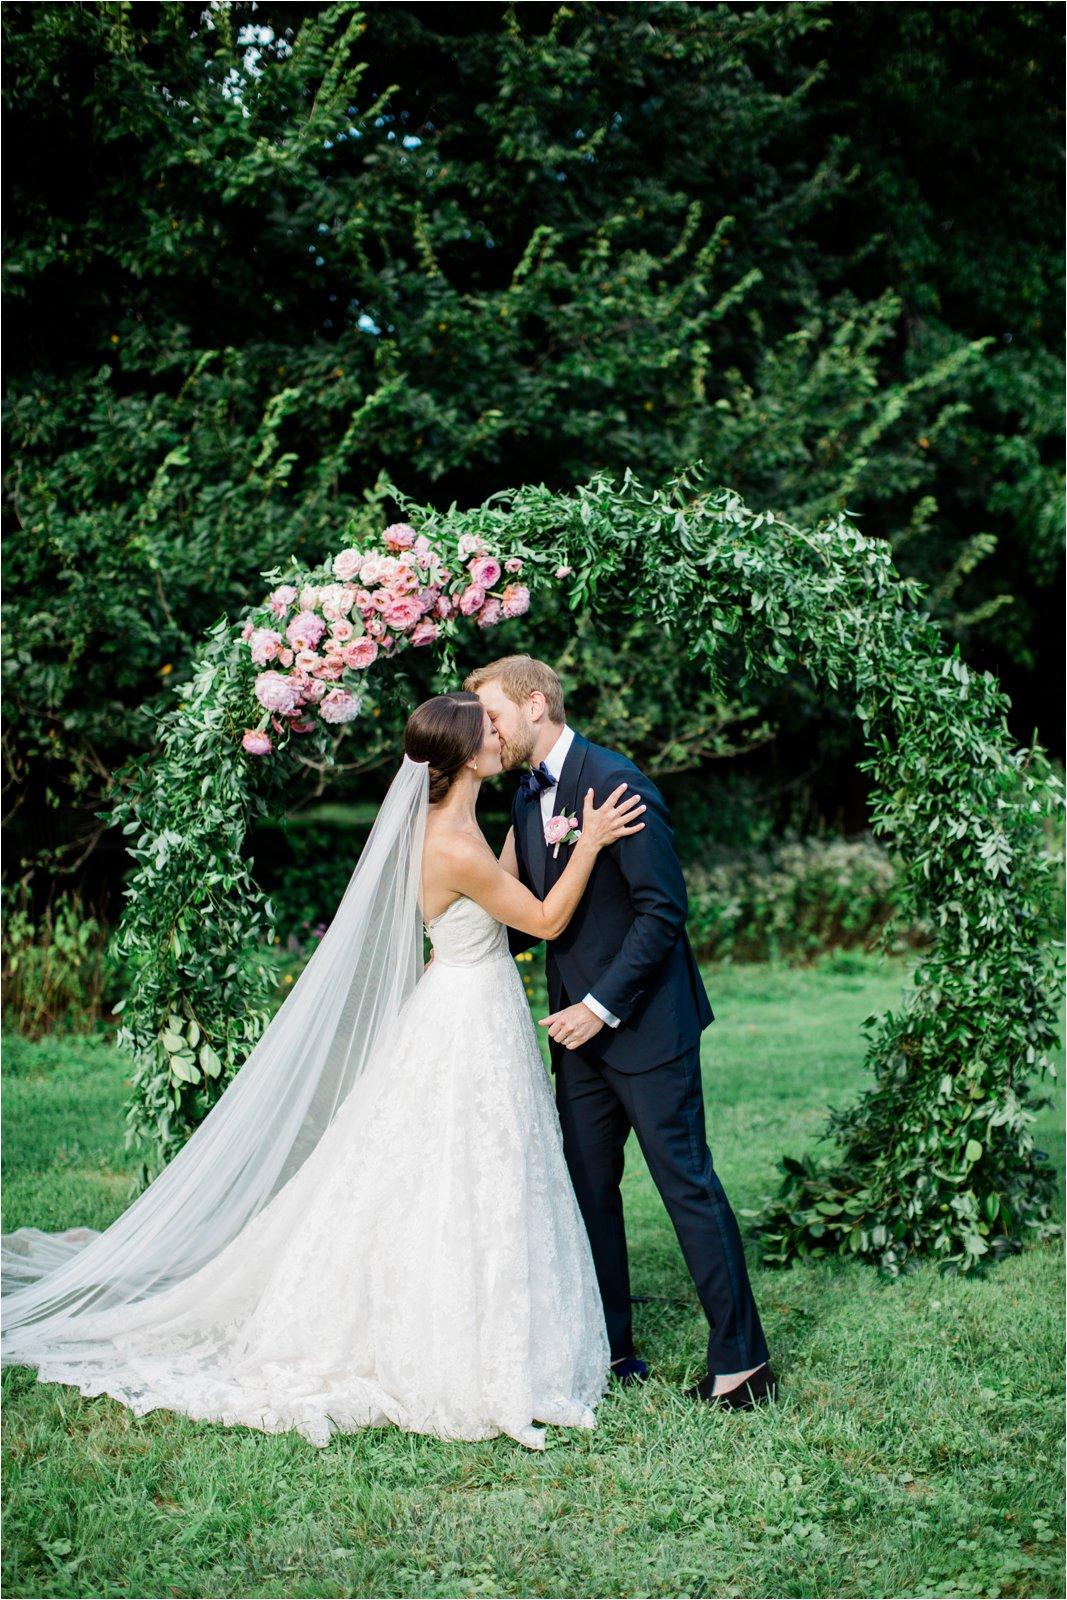 Baltimore Wedding Photographer_088.jpg